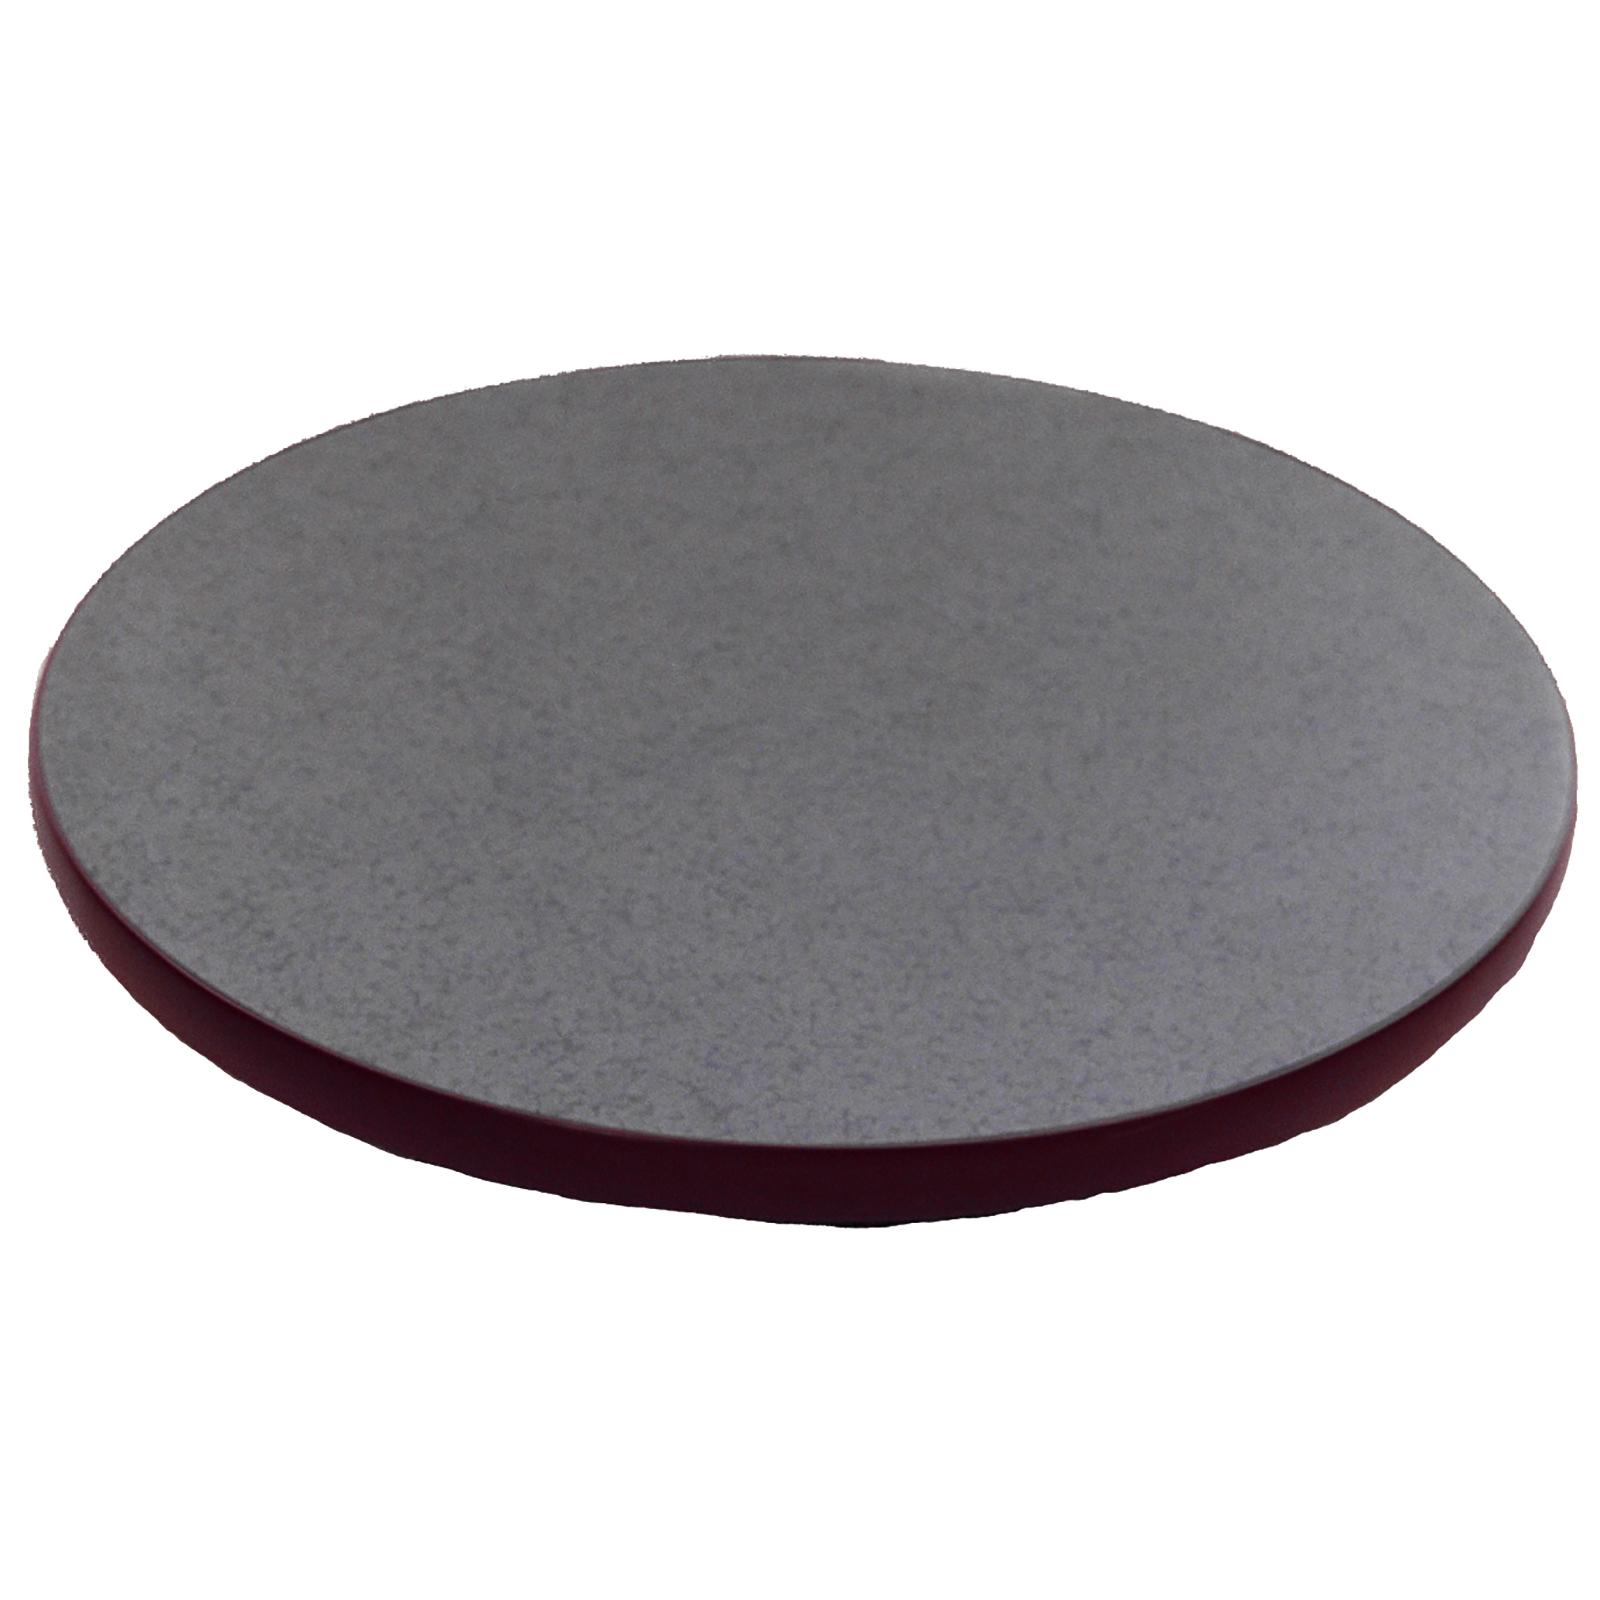 Oak Street CTM3660-1 table top, laminate